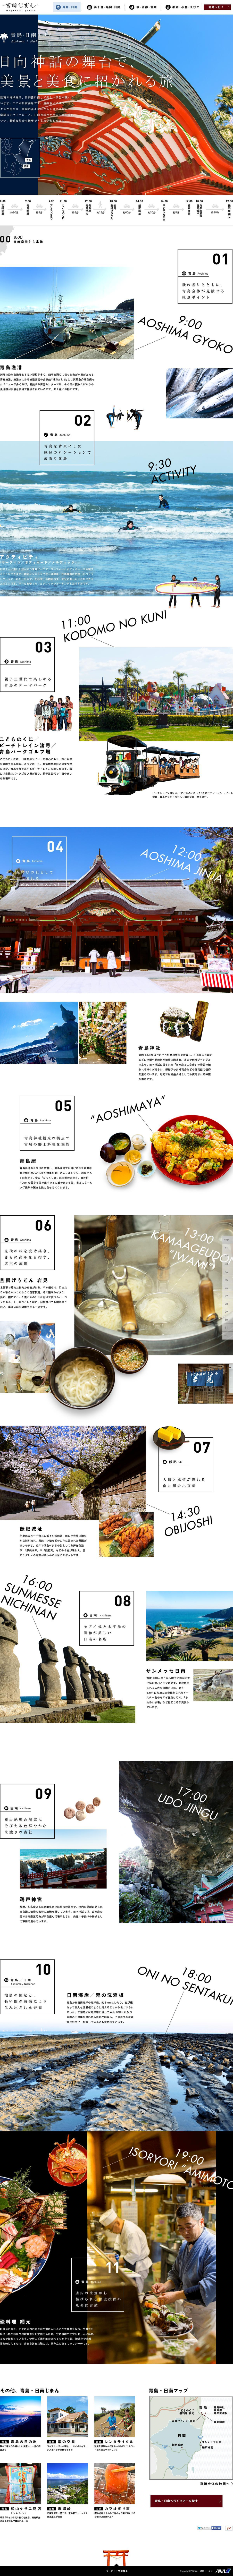 The website 'http://www.miyazaki-jiman.jp/aoshima/' courtesy of @Pinstamatic (http://pinstamatic.com)